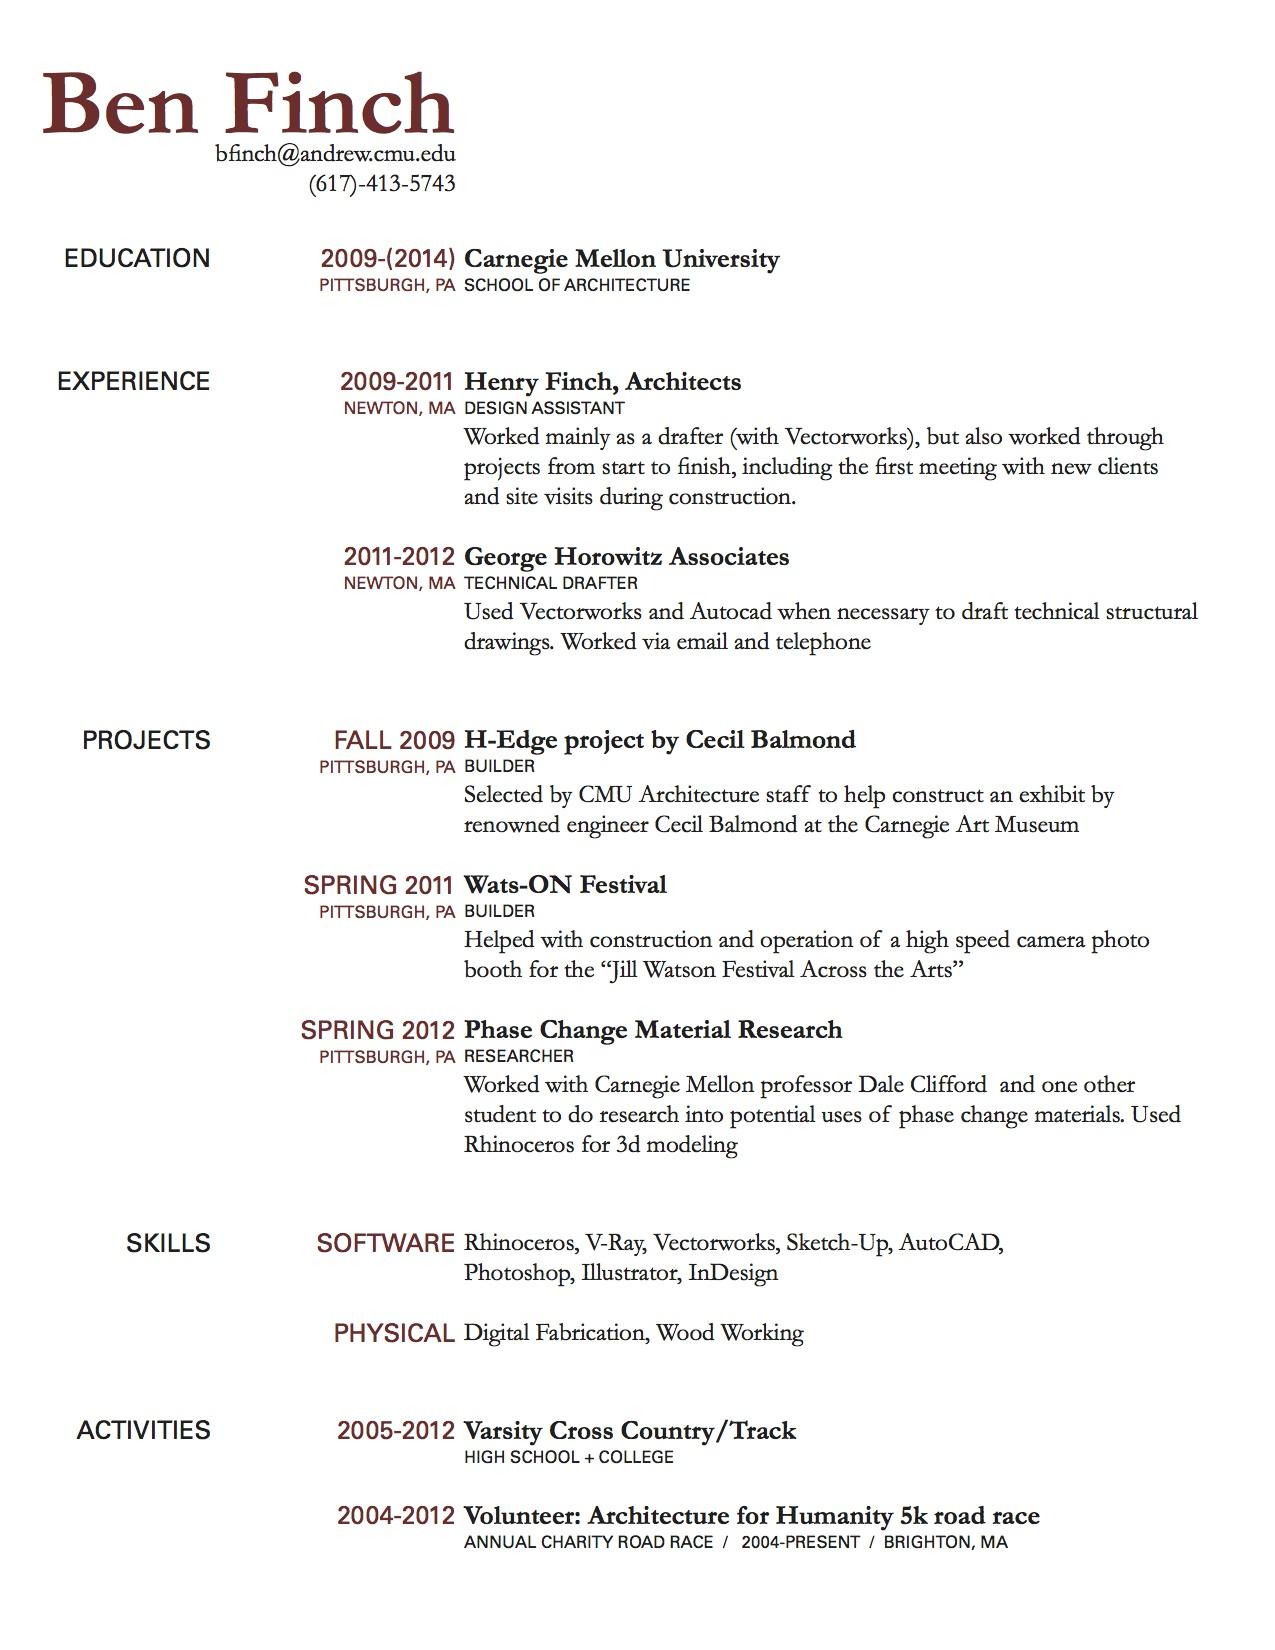 Resume Rough Draft Ben Finch Cdf